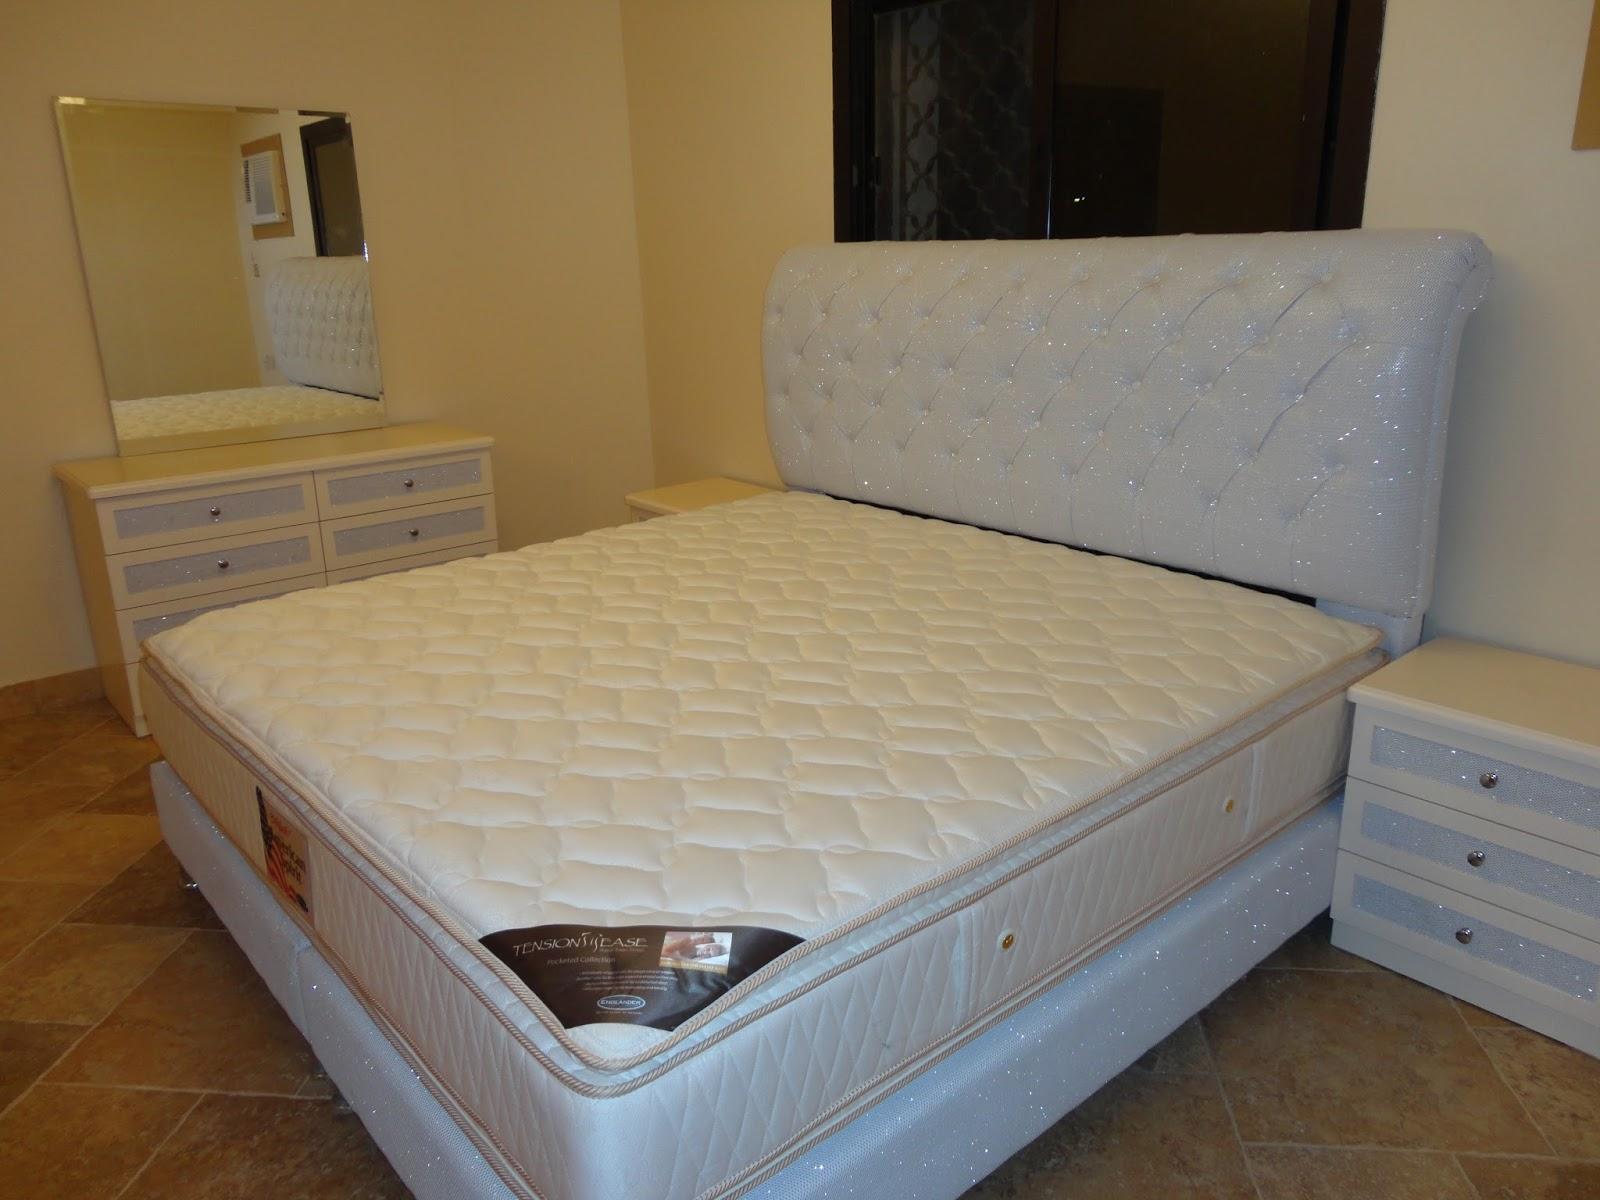 احسن مراتب احسن مراتب طبيه Best mattresses